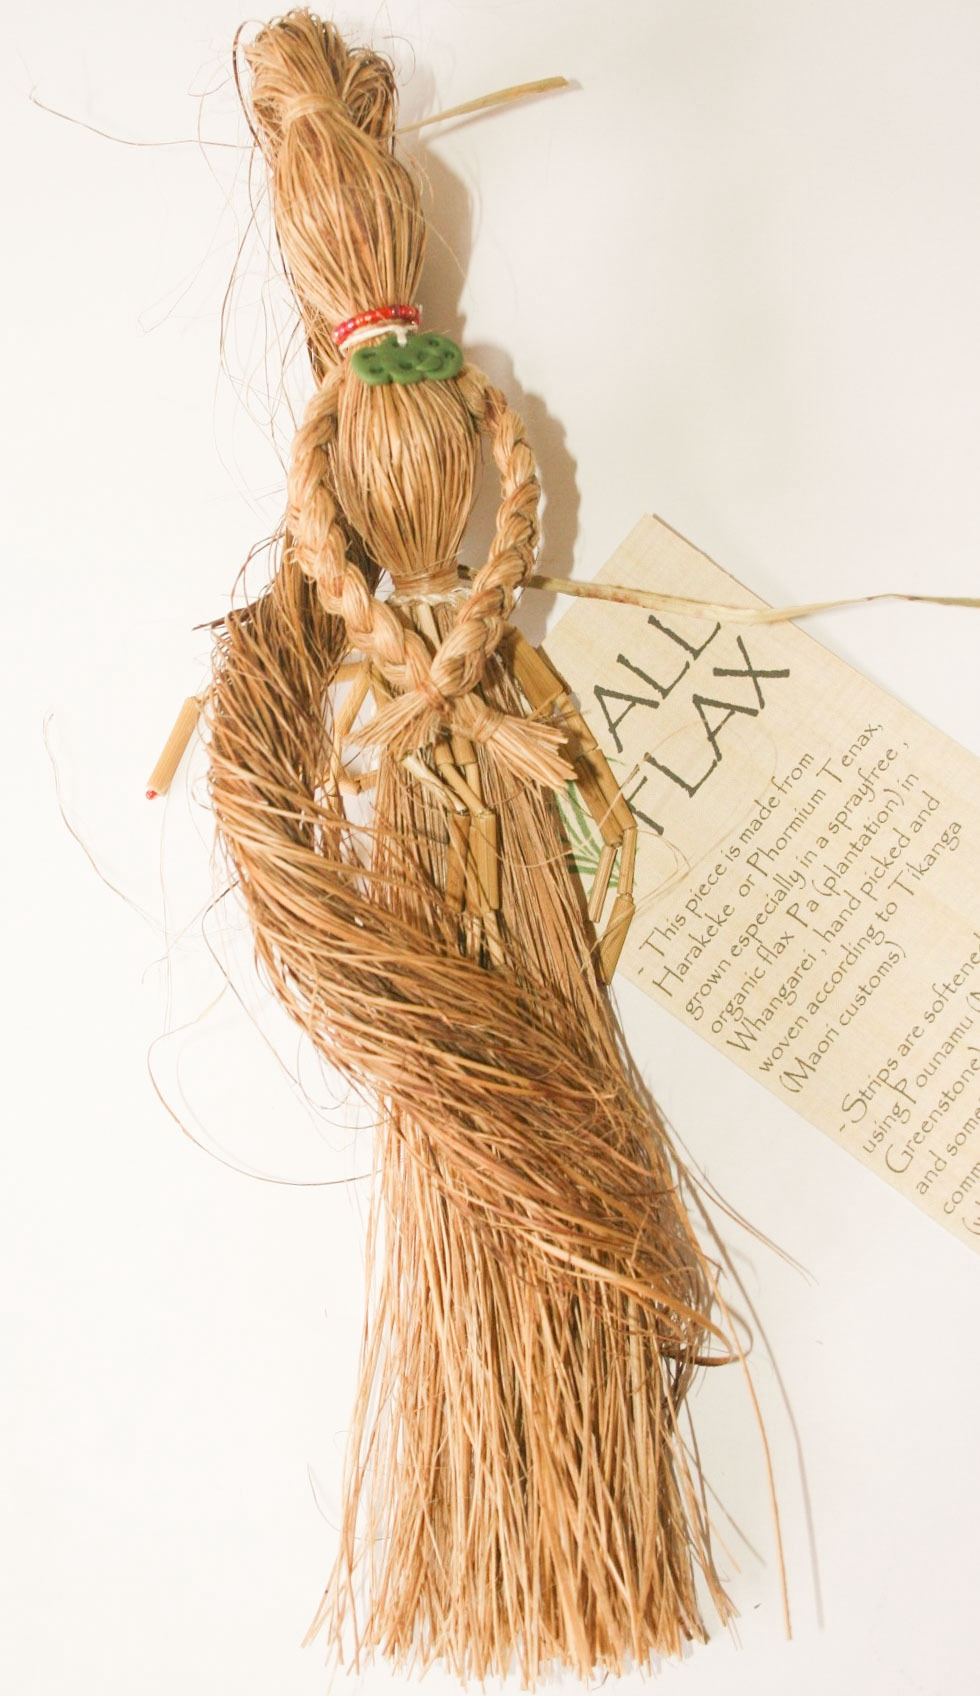 Flax Lady Piupiy Beads and Tiki